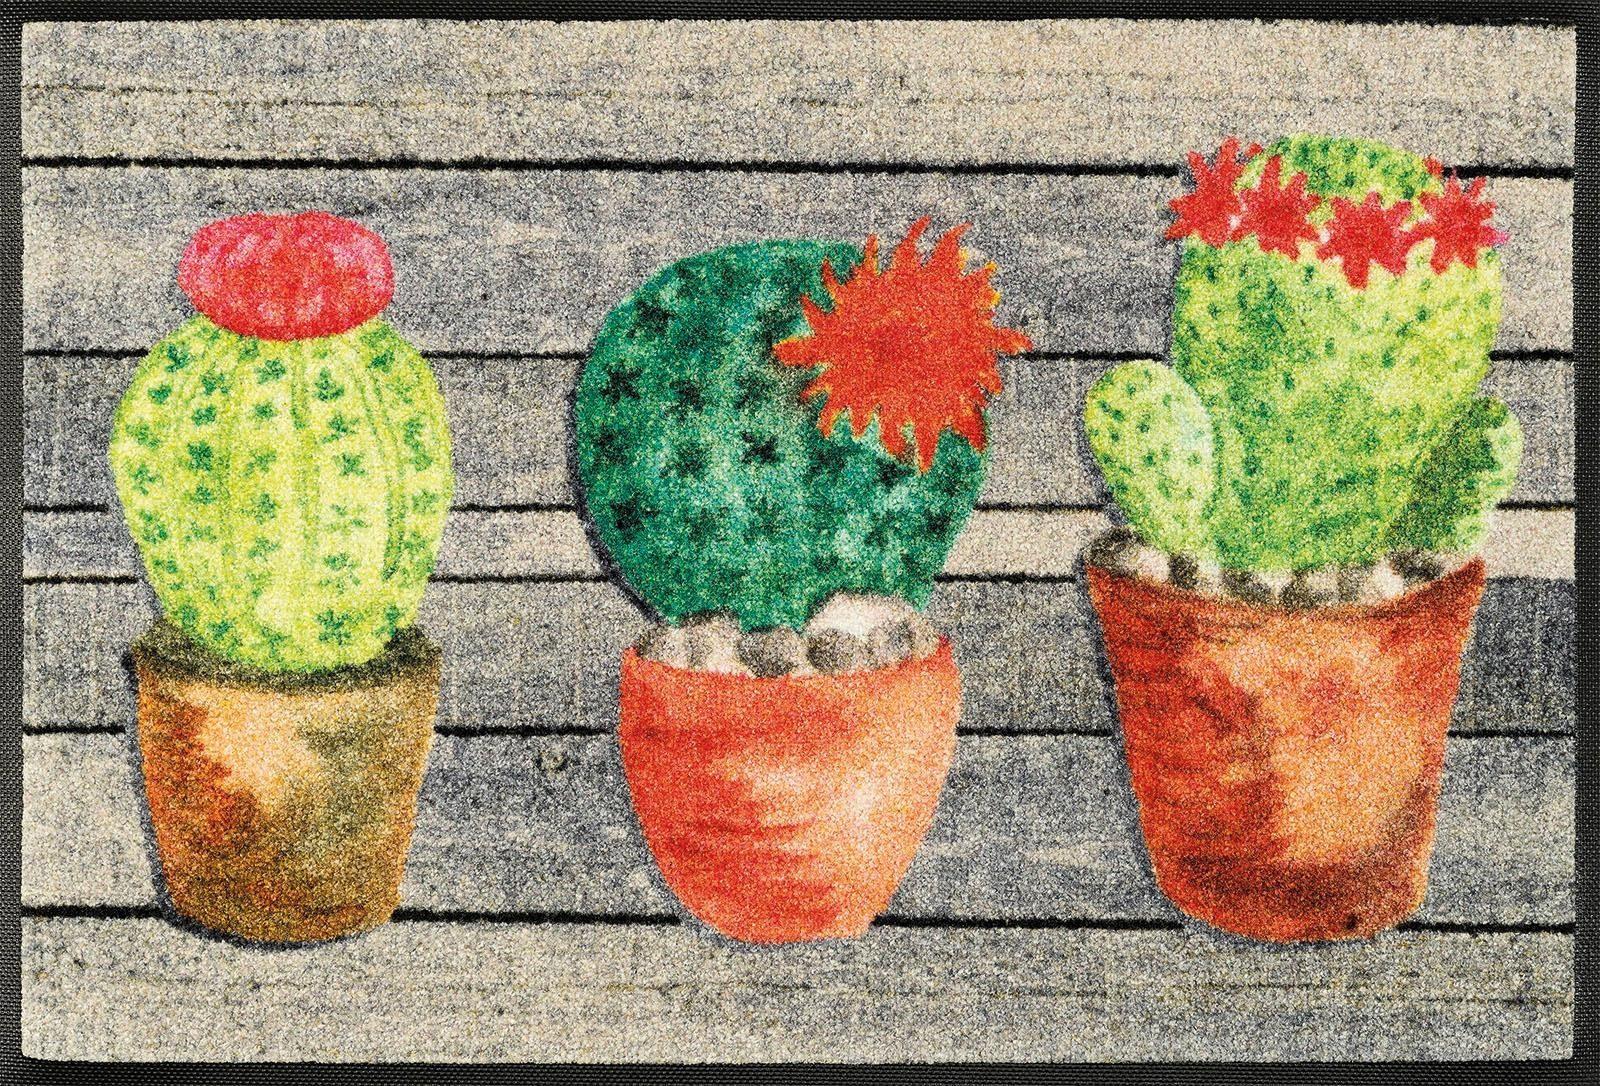 Fußmatte »Jardin de Cactus«, wash+dry by Kleen-Tex, rechteckig, Höhe 7 mm